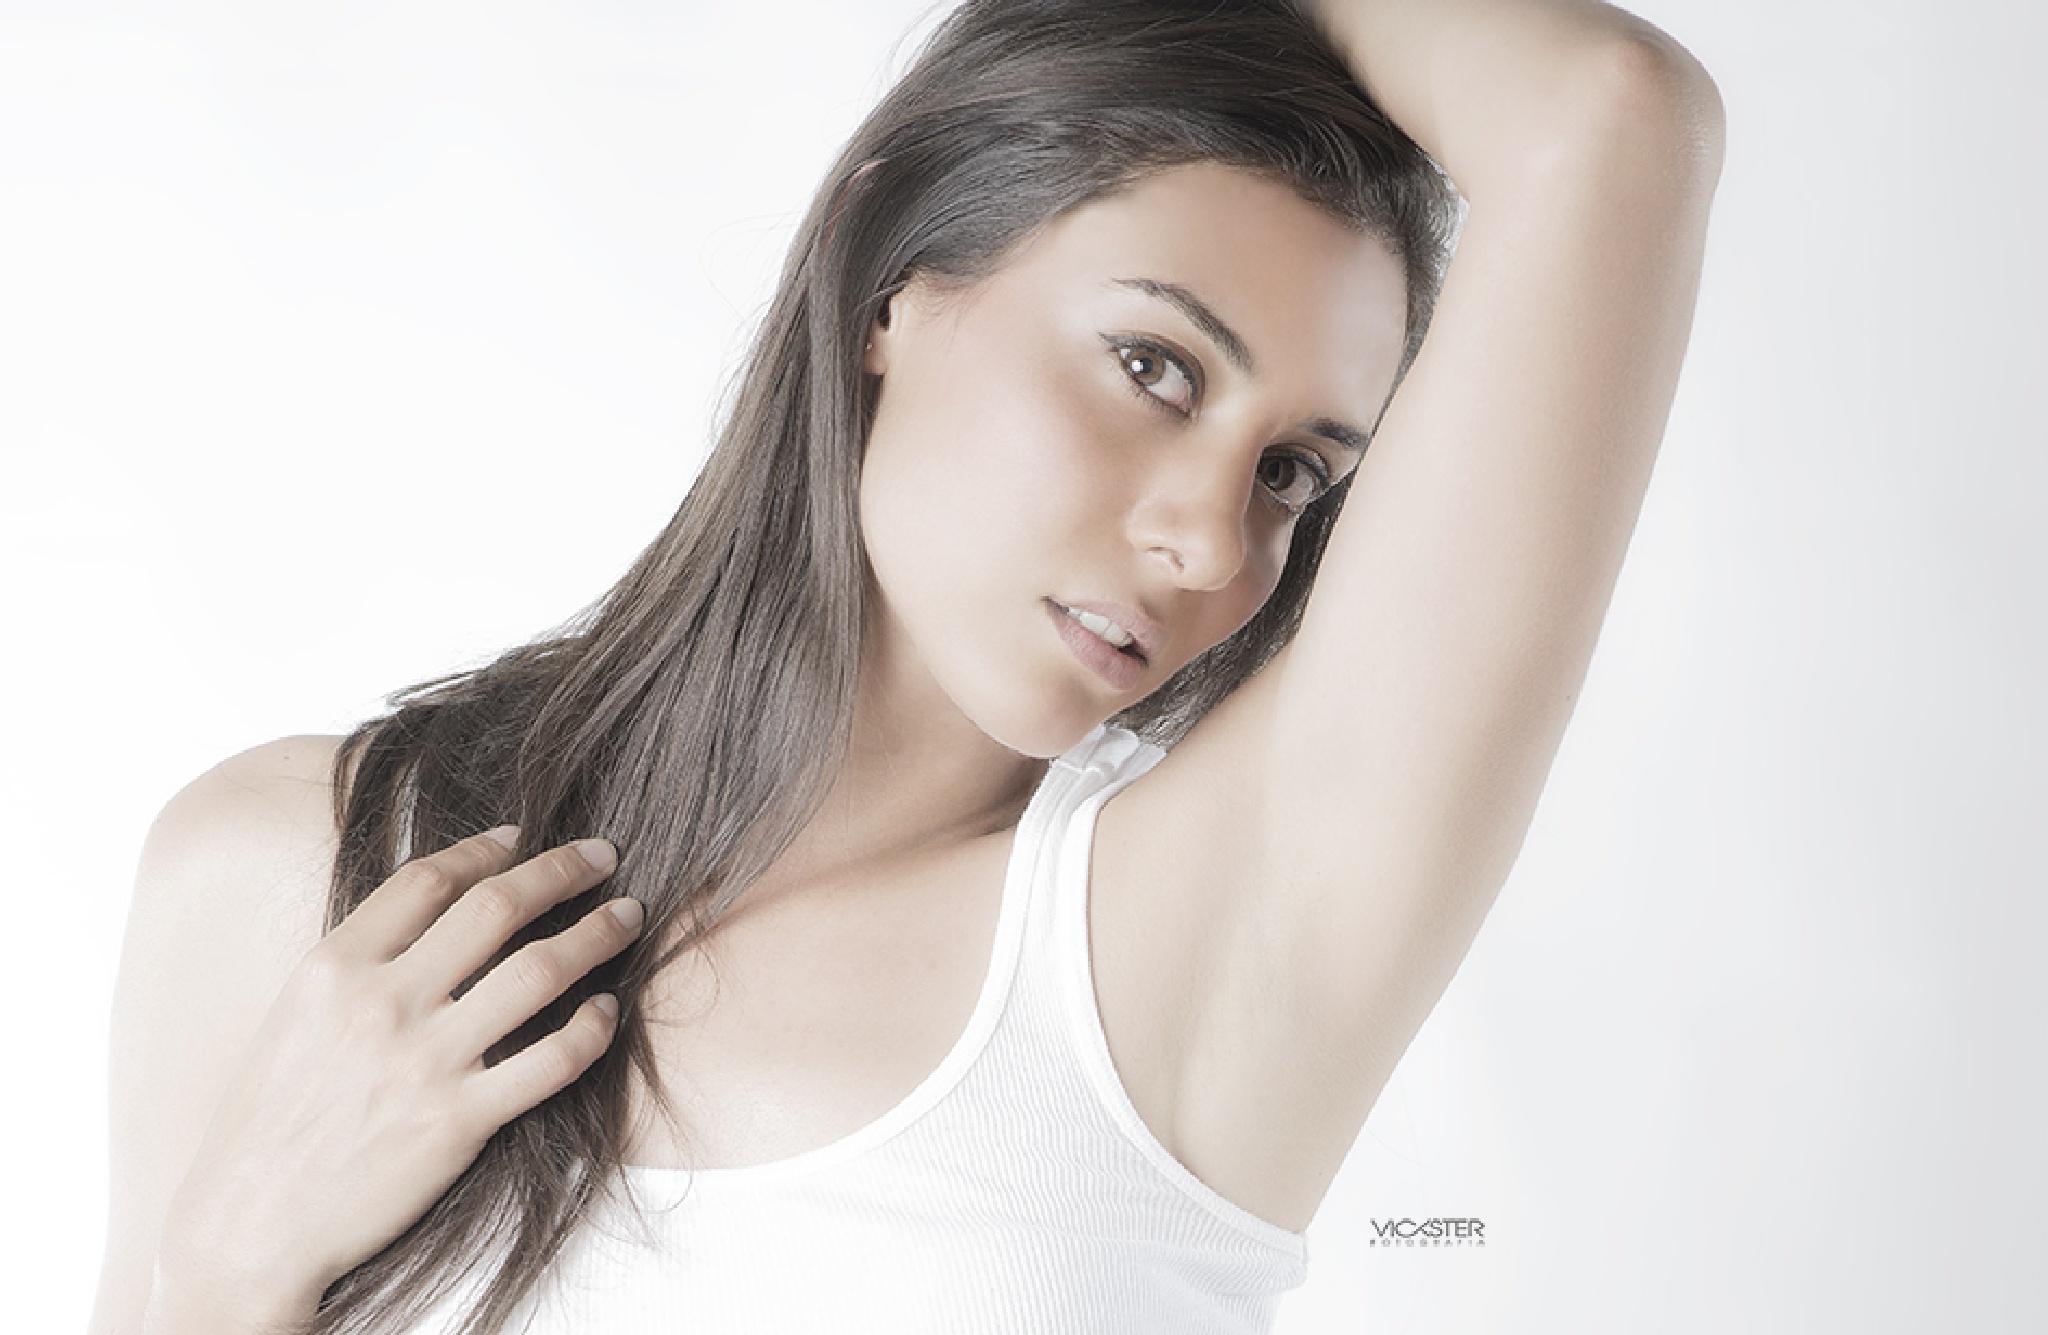 Fernanda by VICKSTER